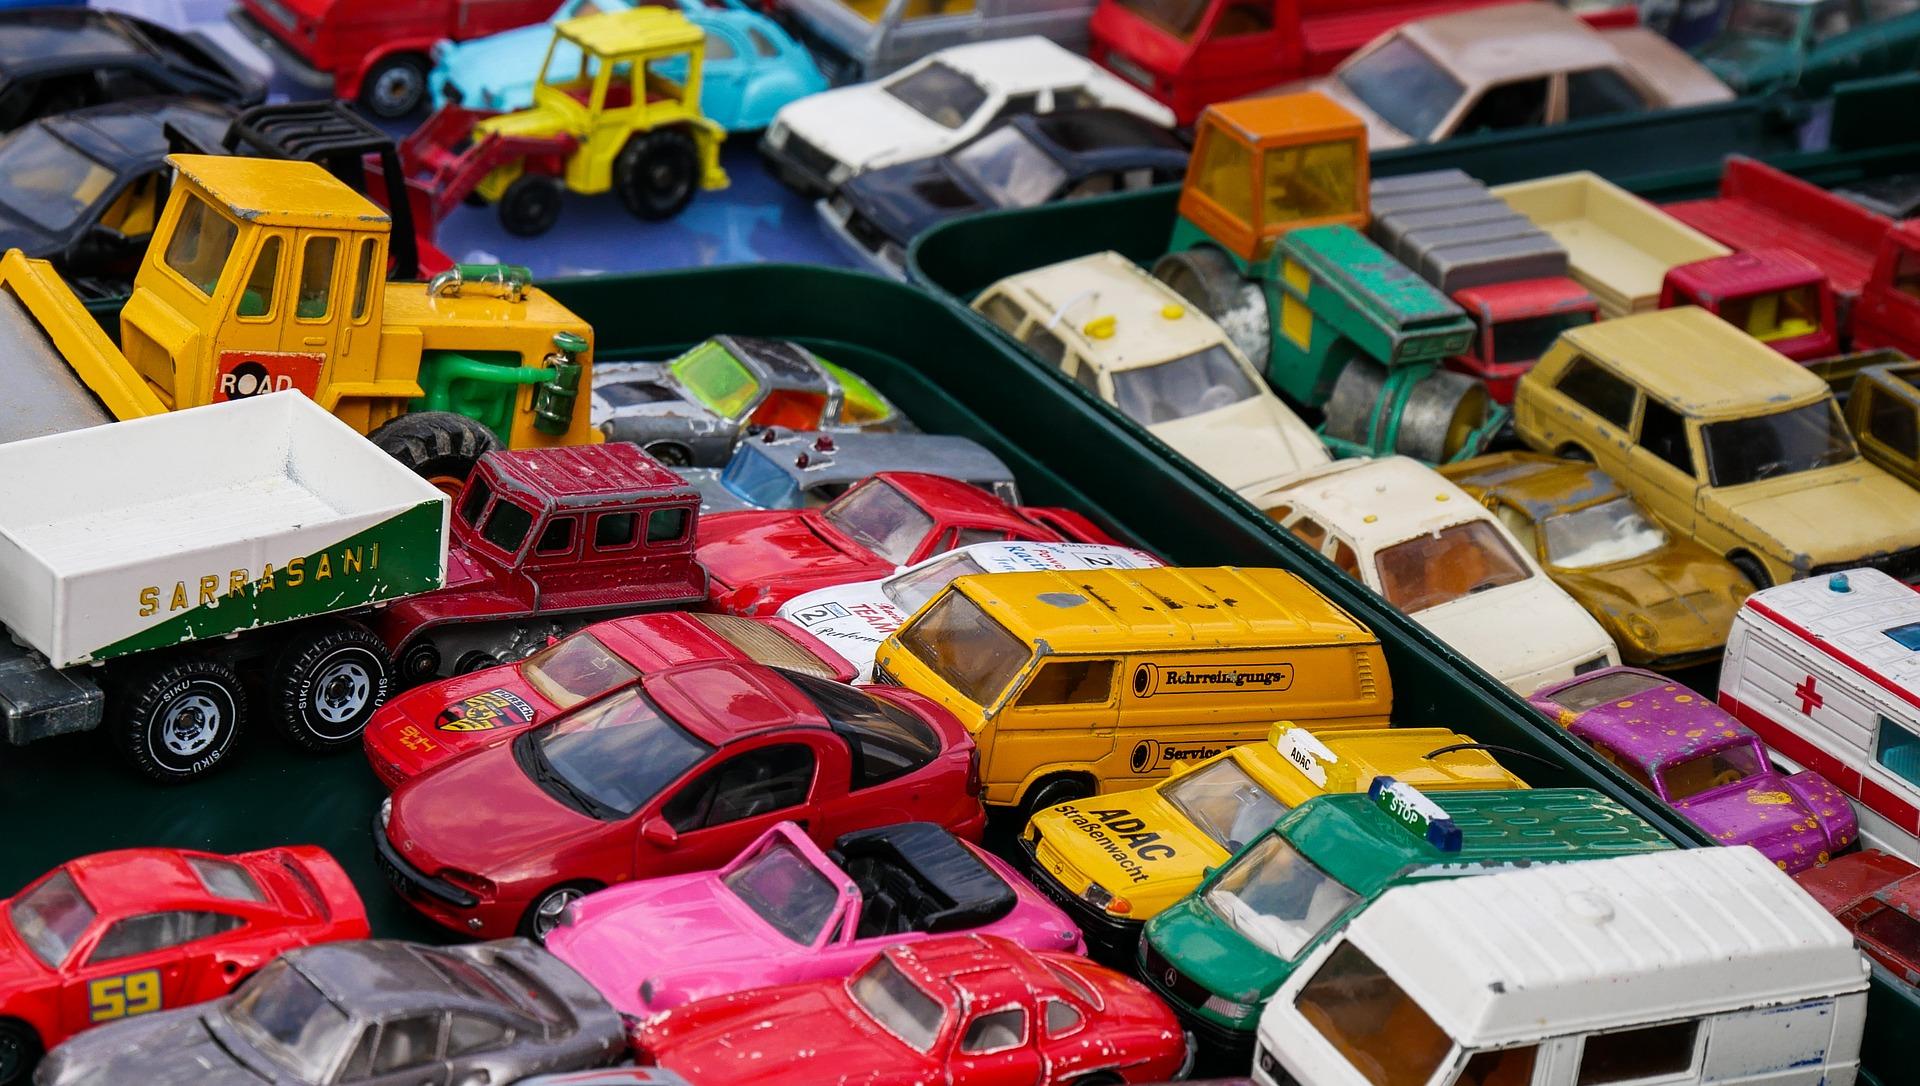 Traffic Jam, Auto, Automobile, Busy, City, HQ Photo